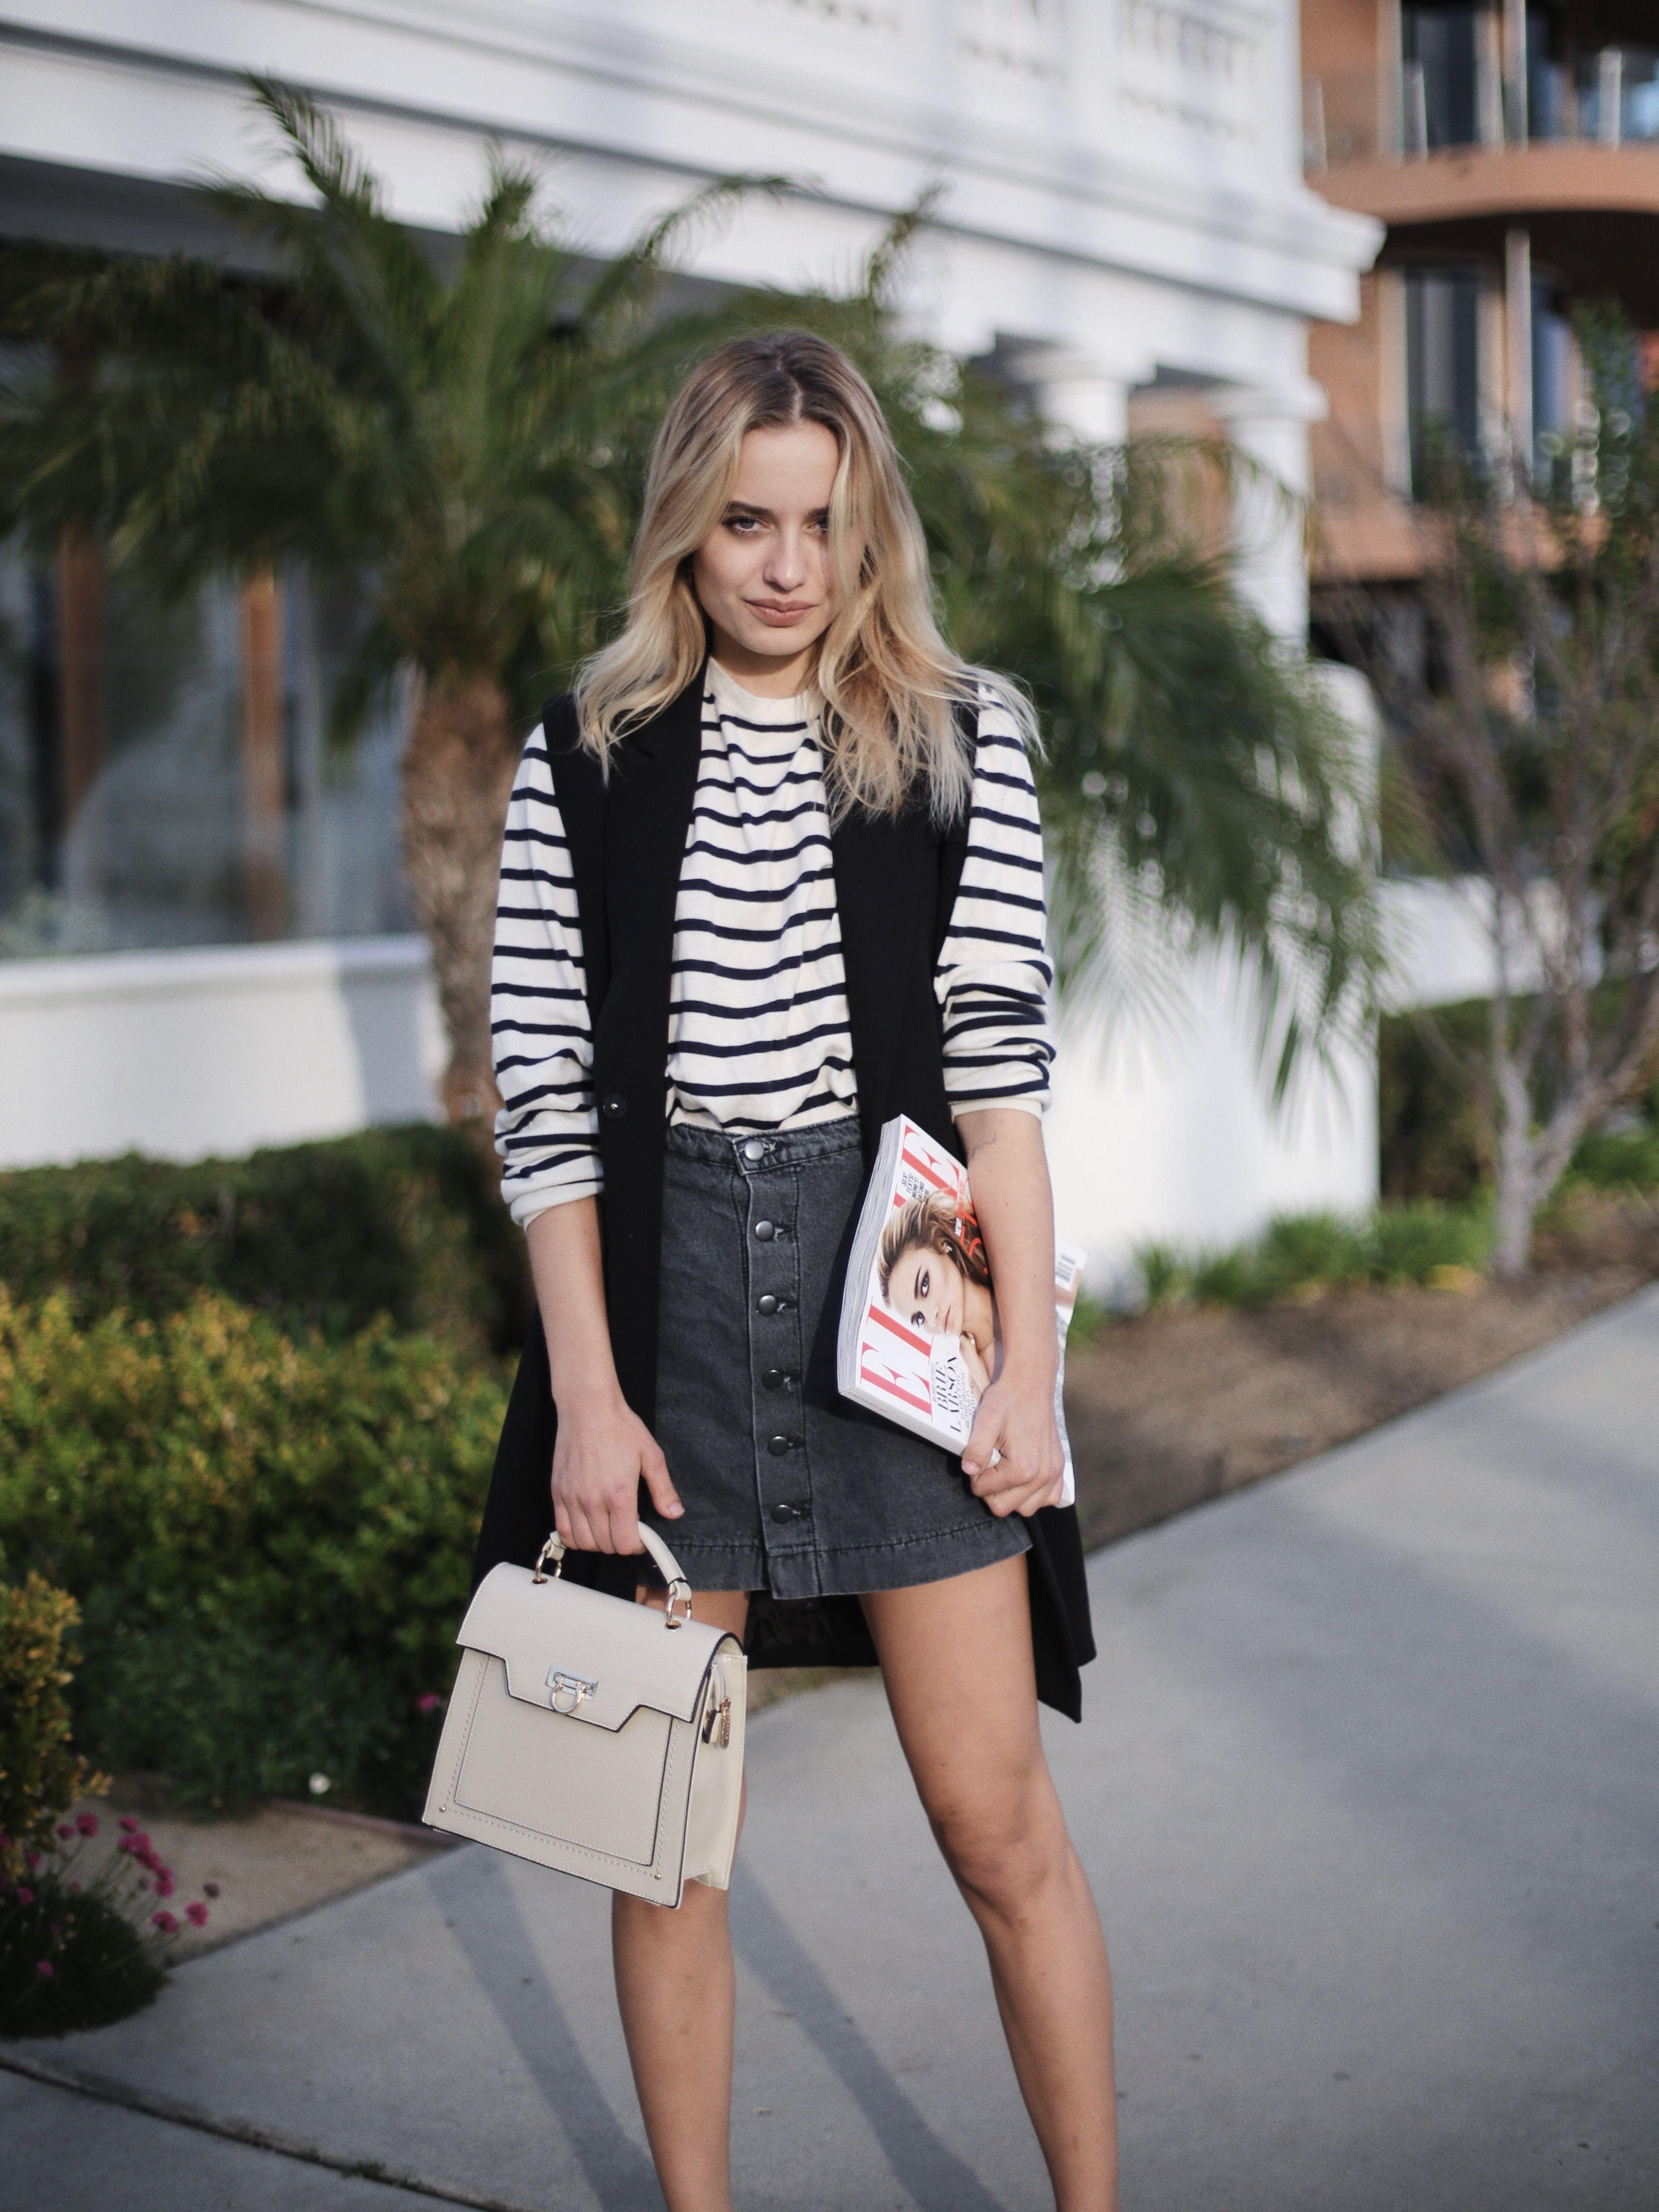 58bcf60cfe2 Fashion blogger